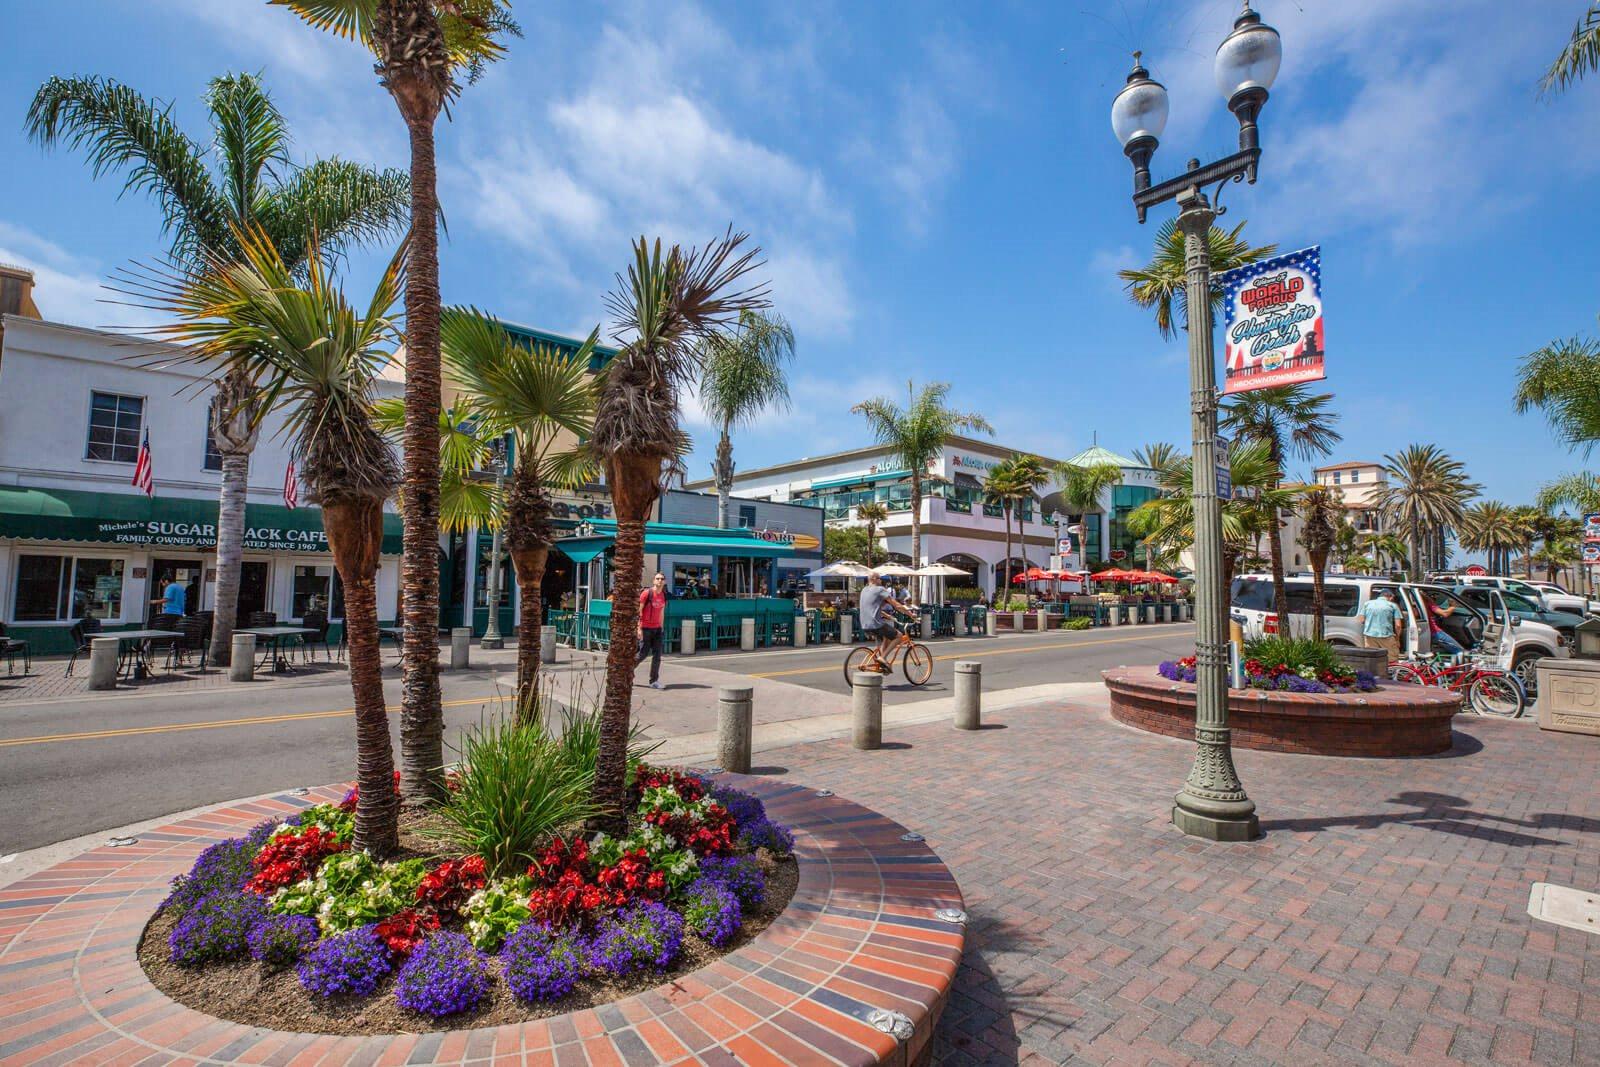 Huntington Beach hopping near Boardwalk by Windsor, California, 92647